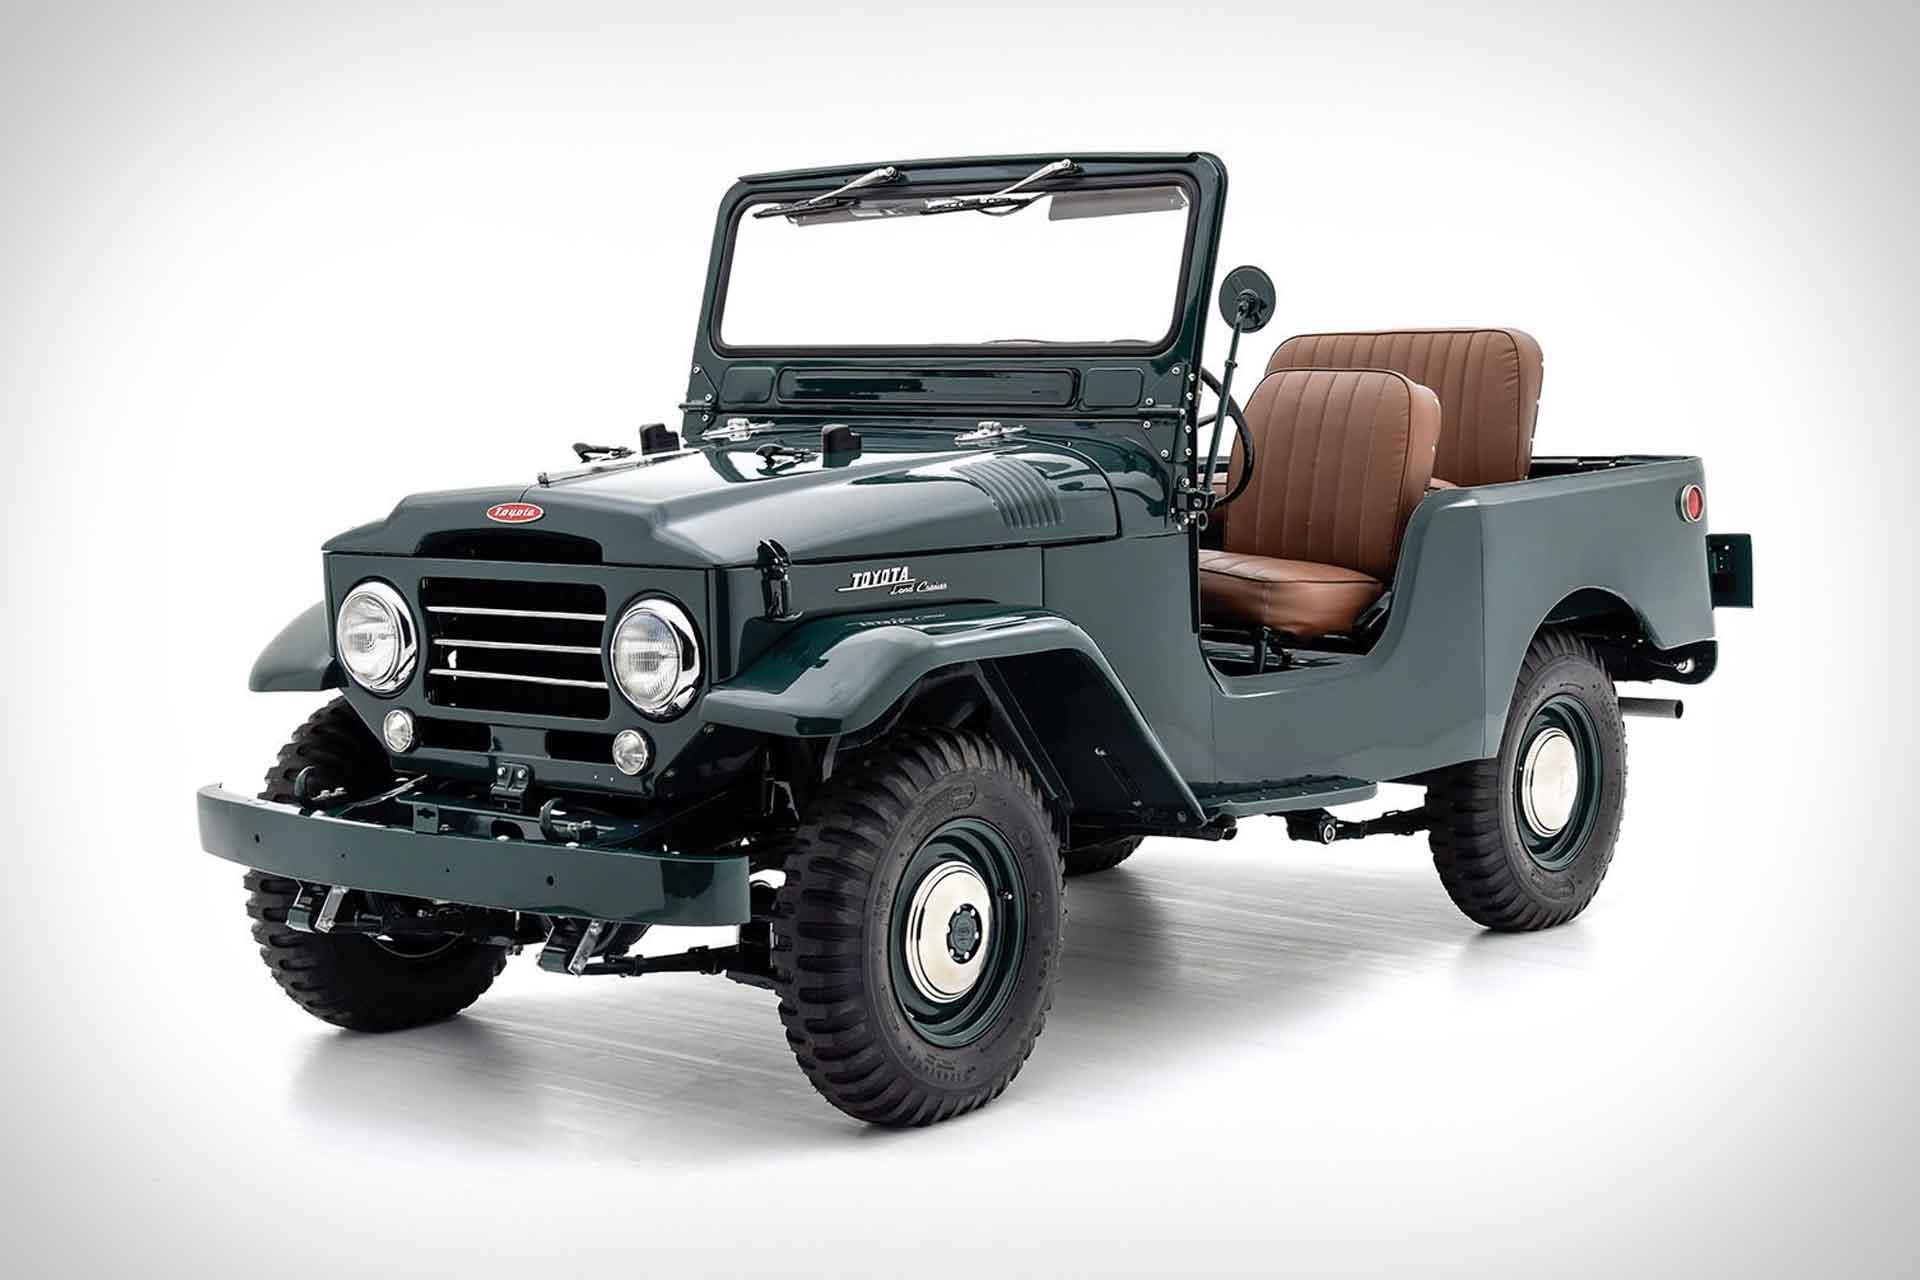 1957 Toyota FJ25 Land Cruiser SUV